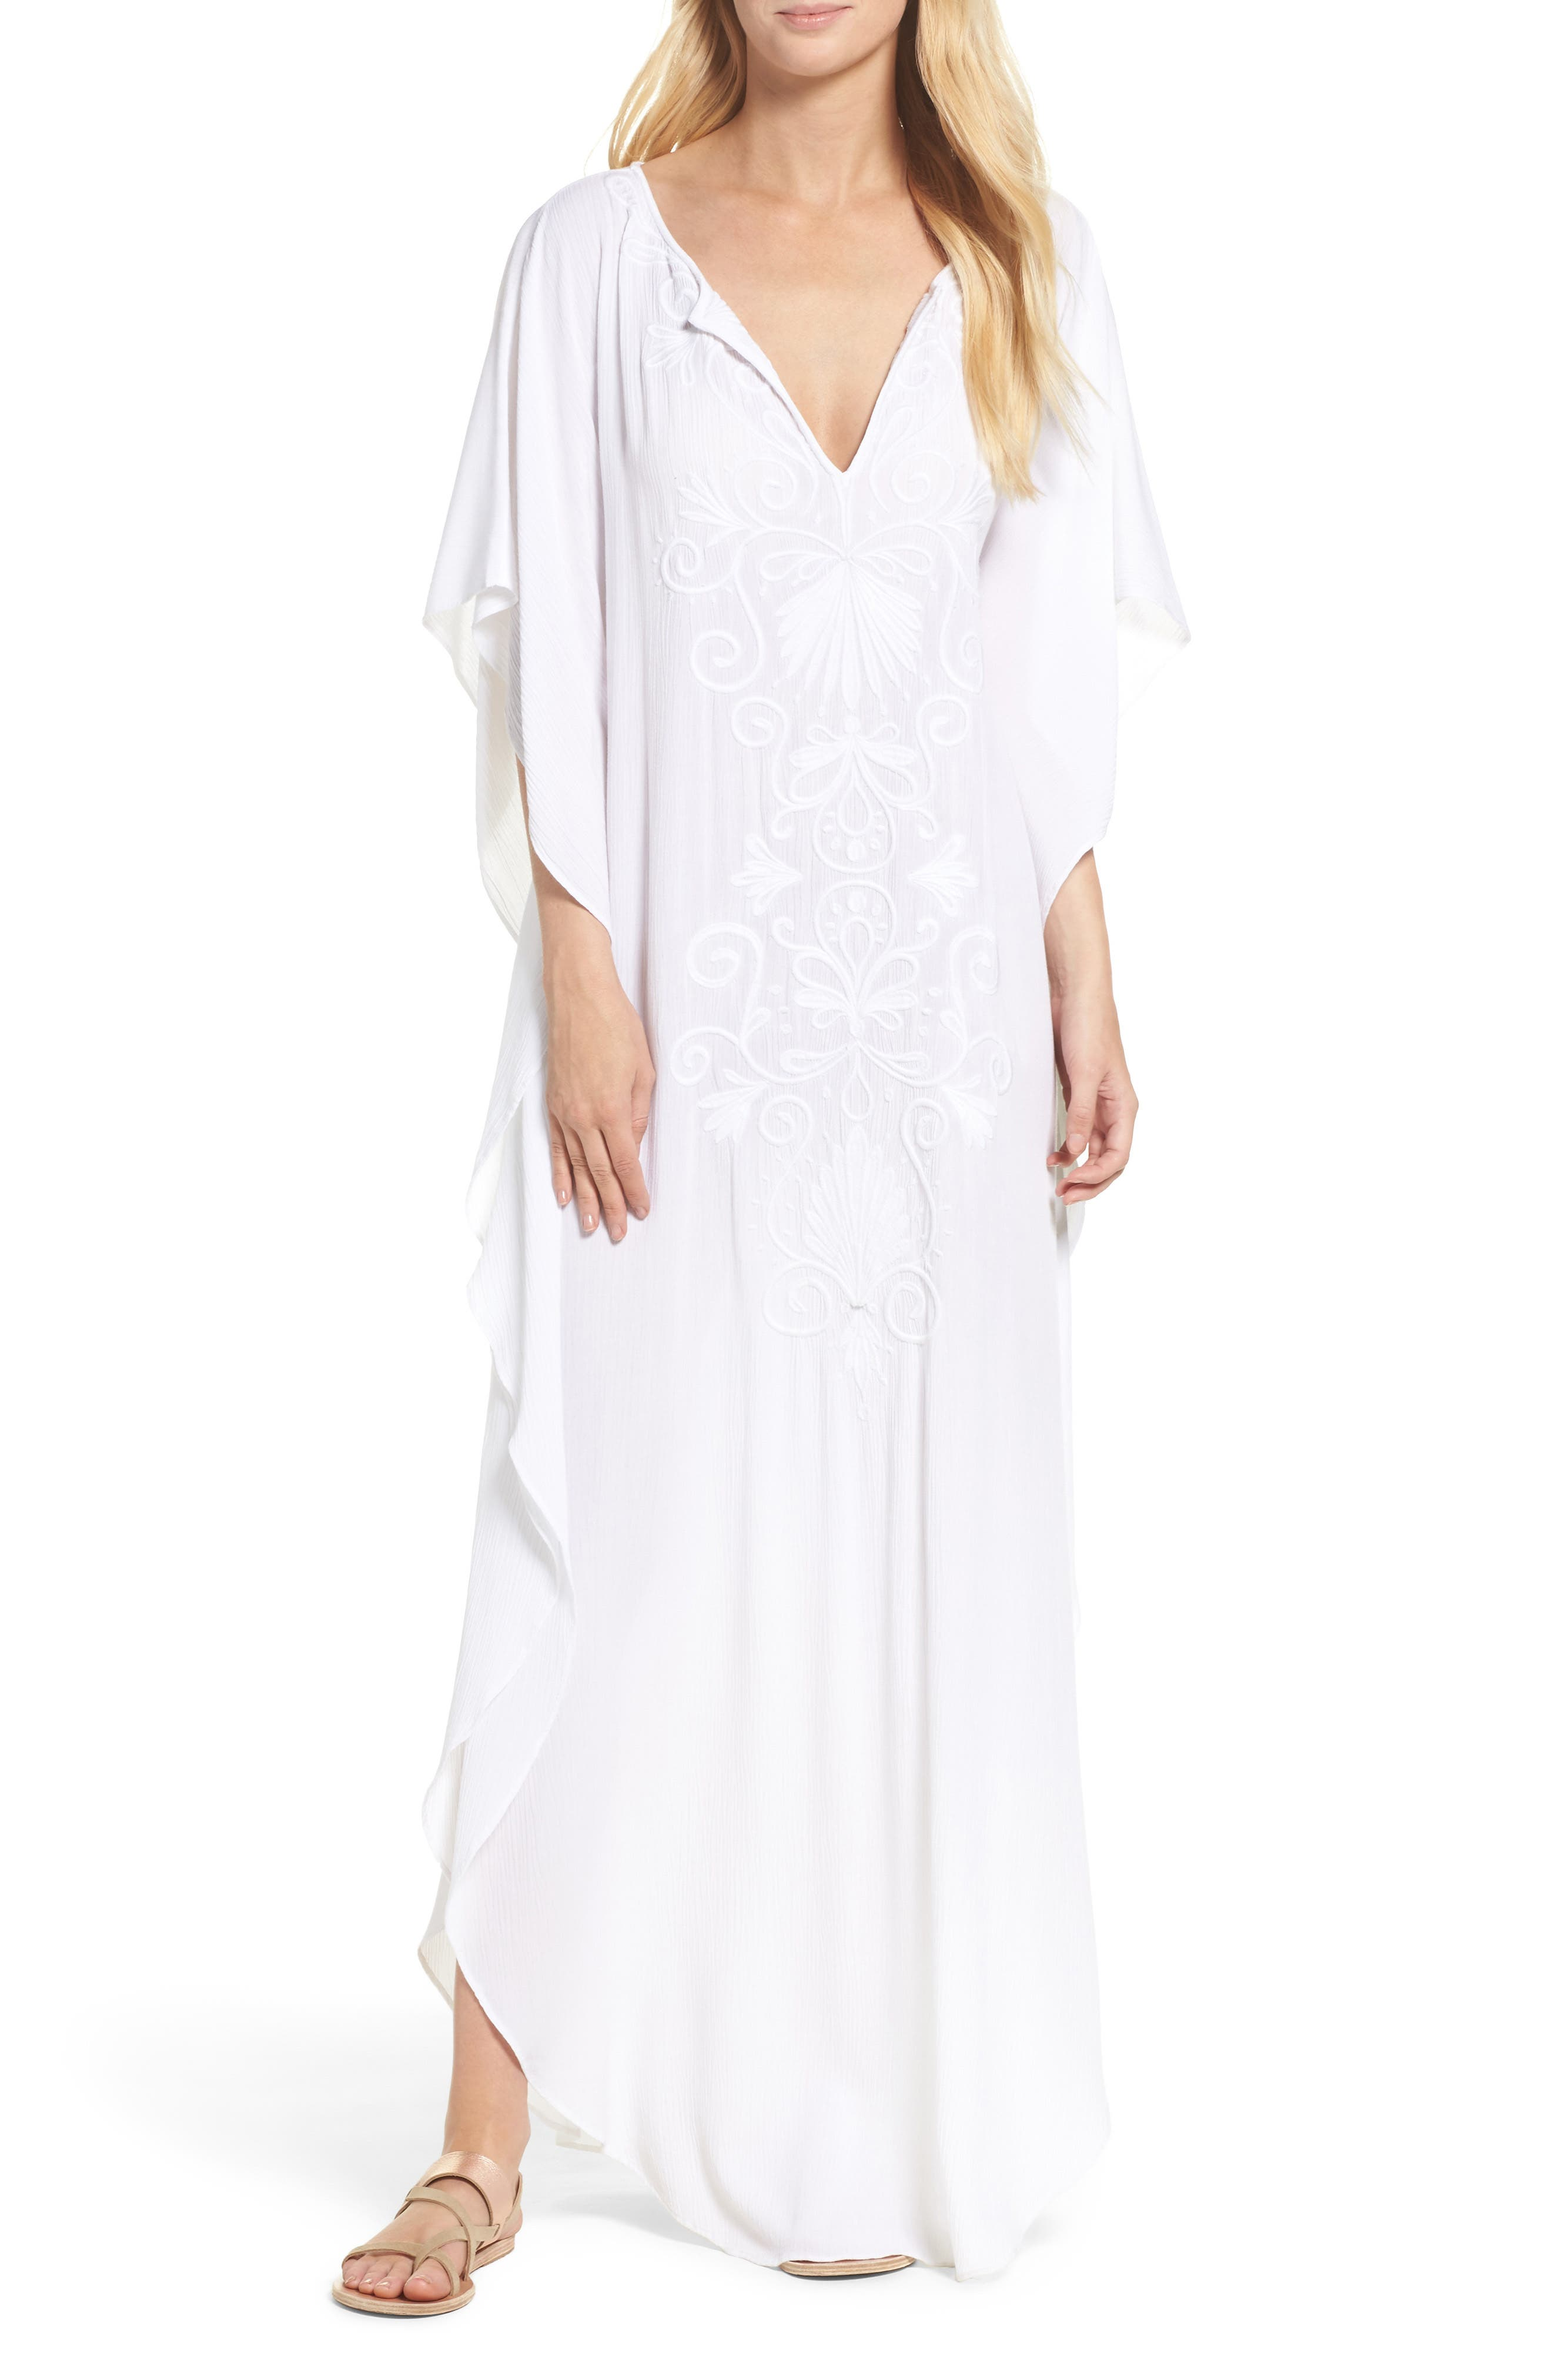 Lilly Pulitzer® Mella Cover-Up Maxi Dress